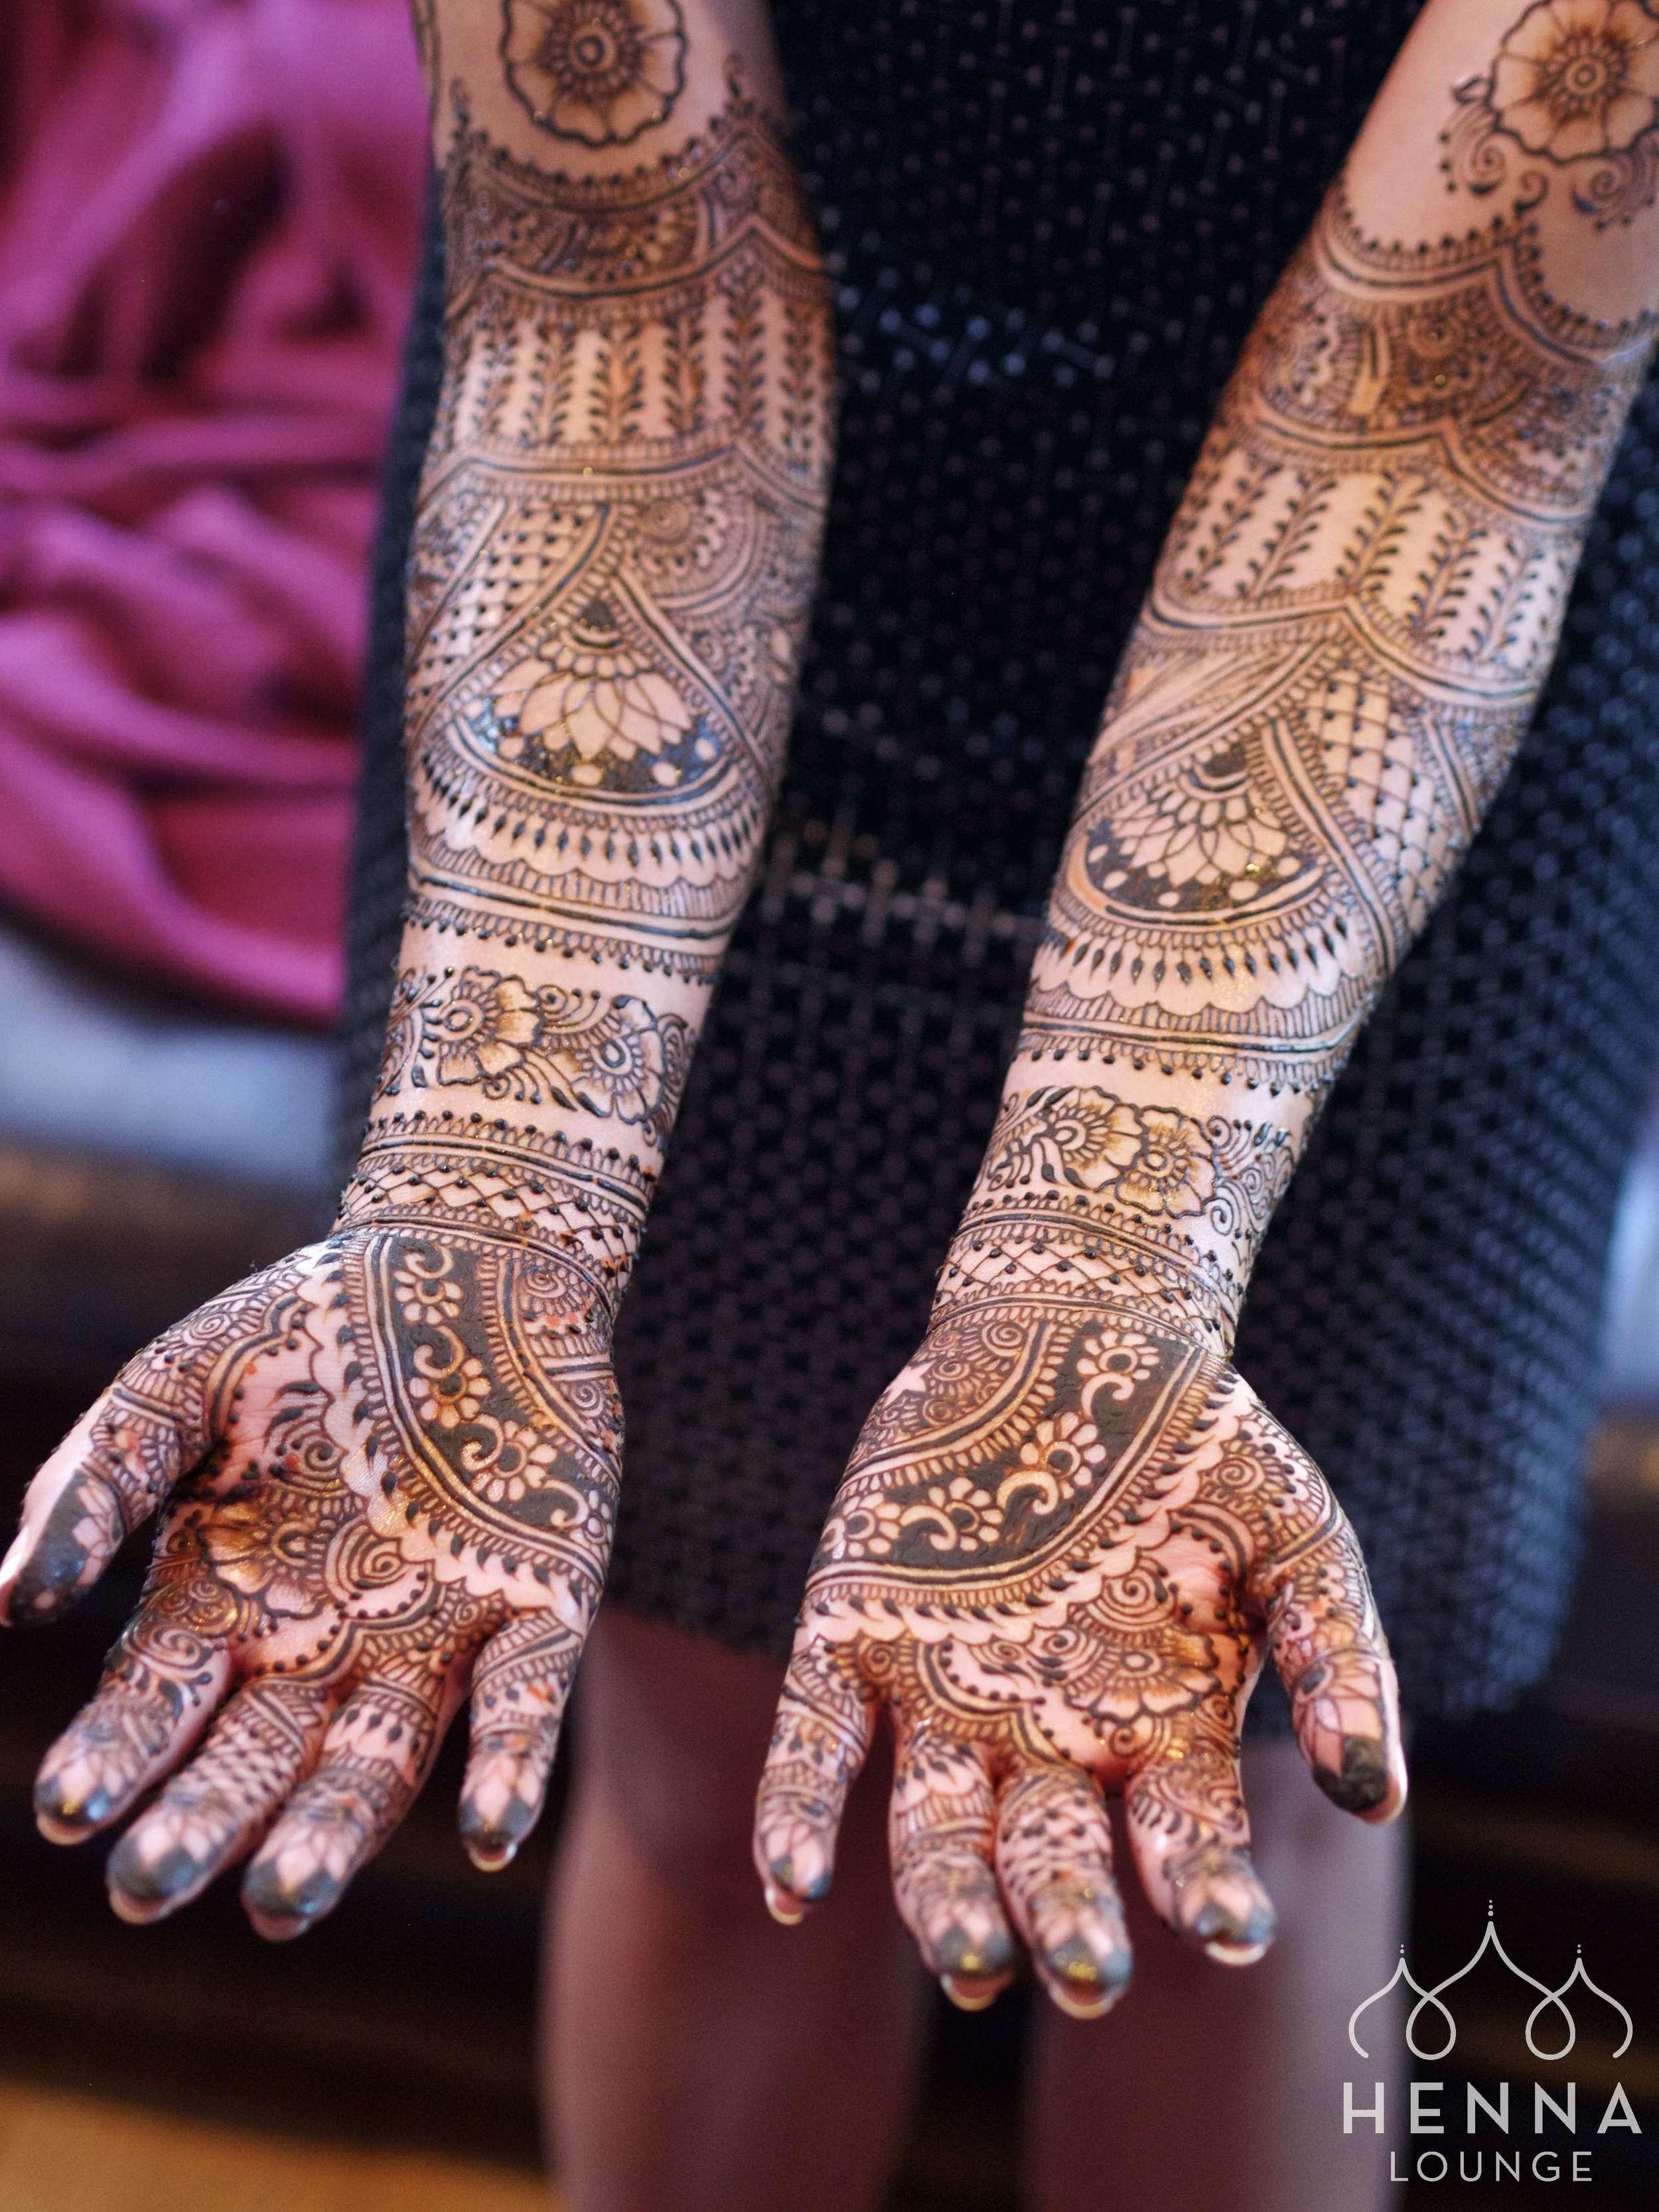 Bespoke bridal mehndi by www.hennalounge.com